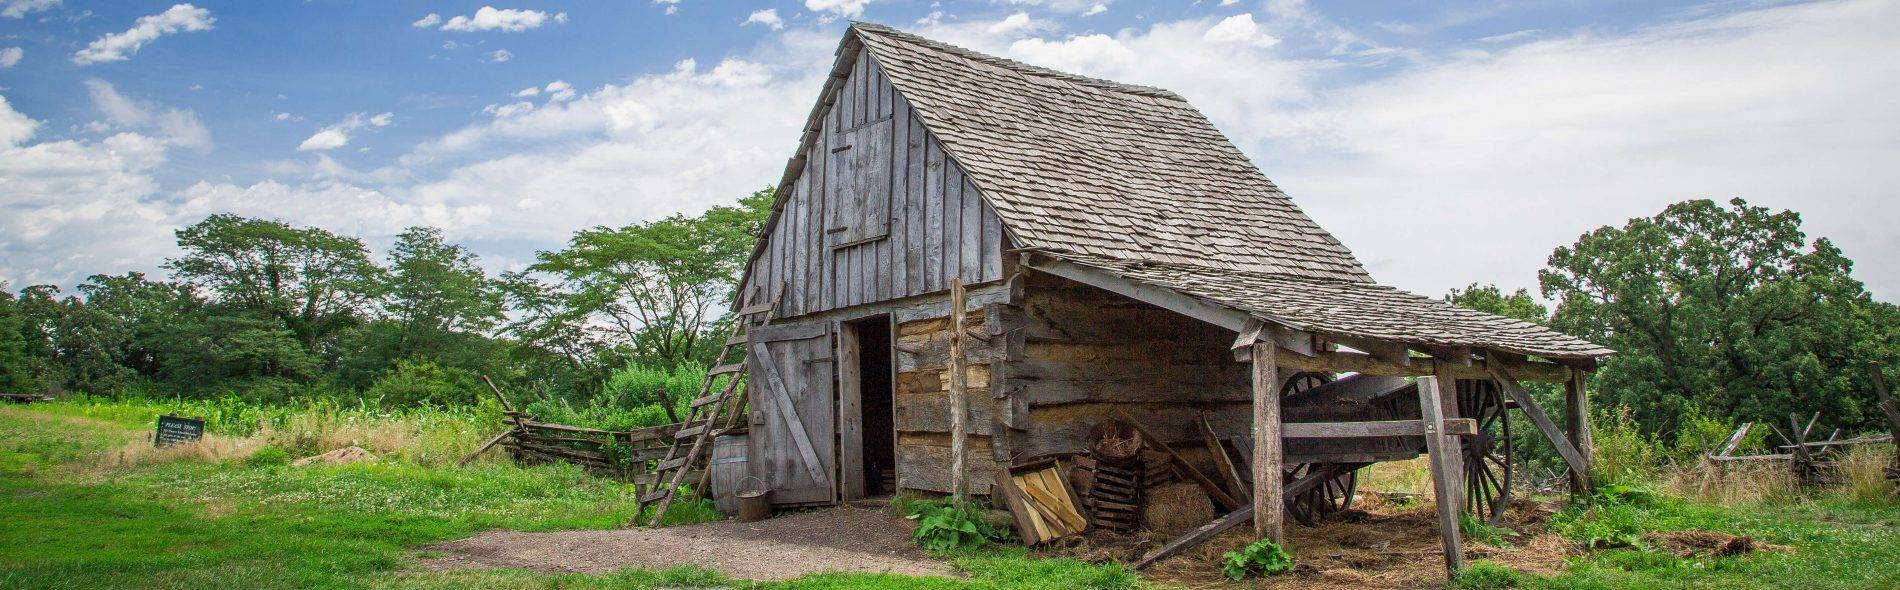 1850 Pioneer Farm.